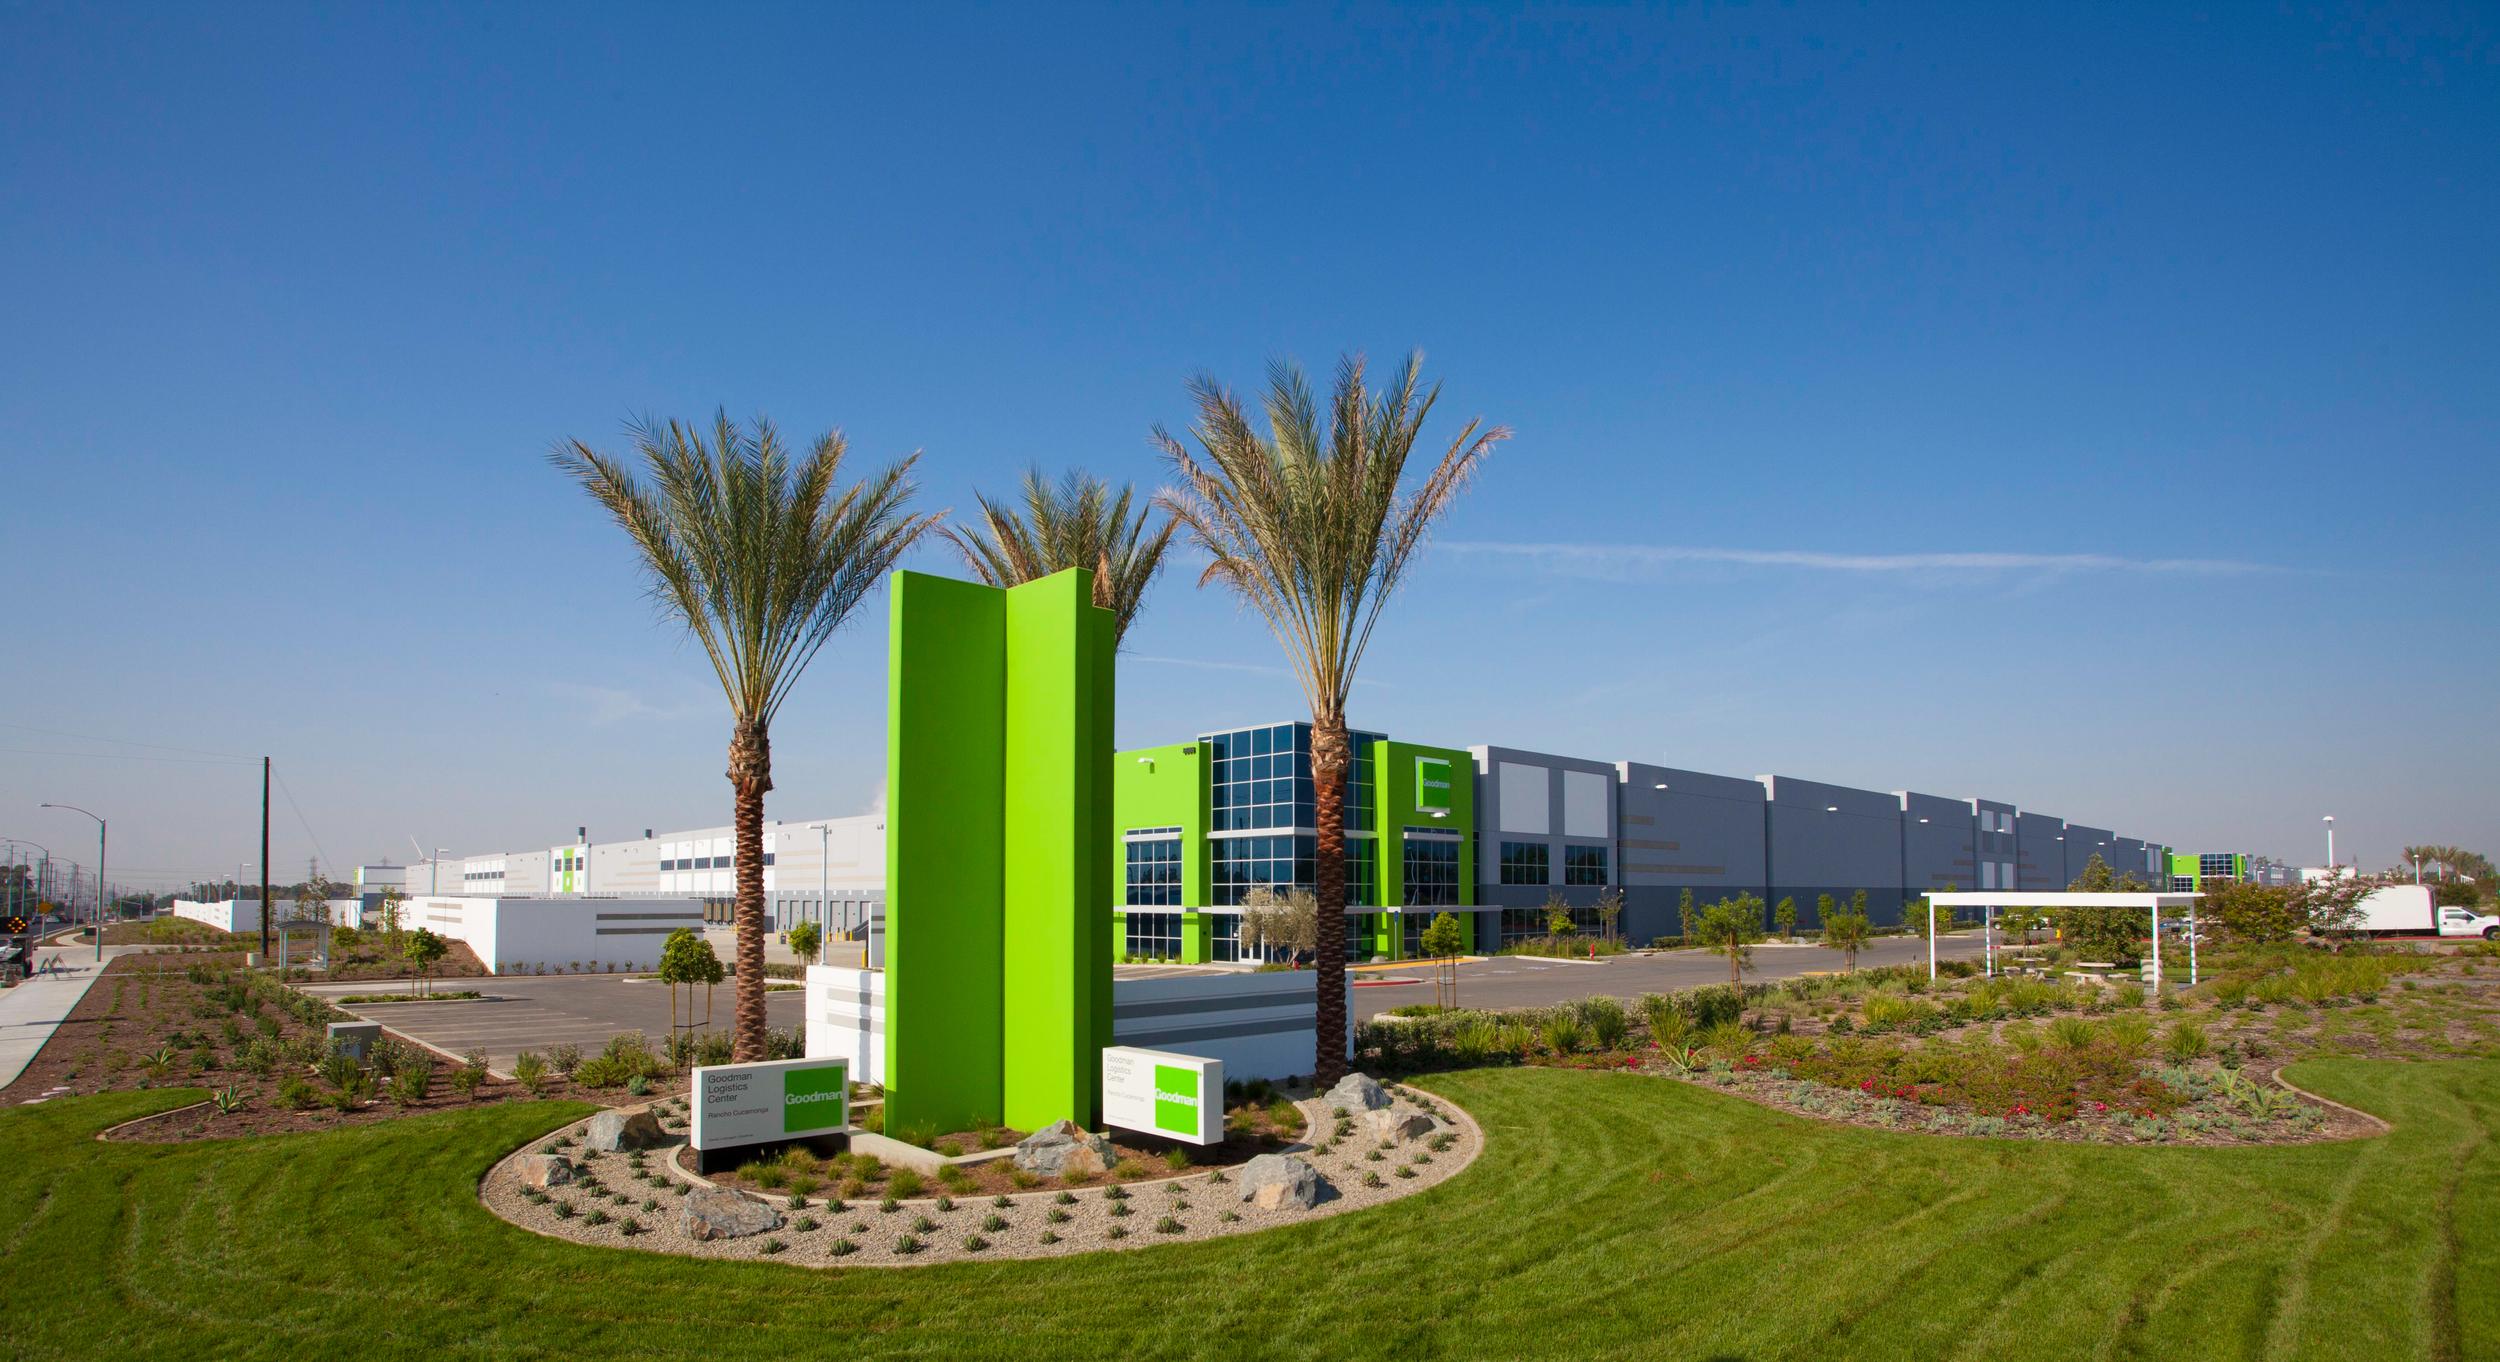 Goodman logistics center - Rancho Cucamonga